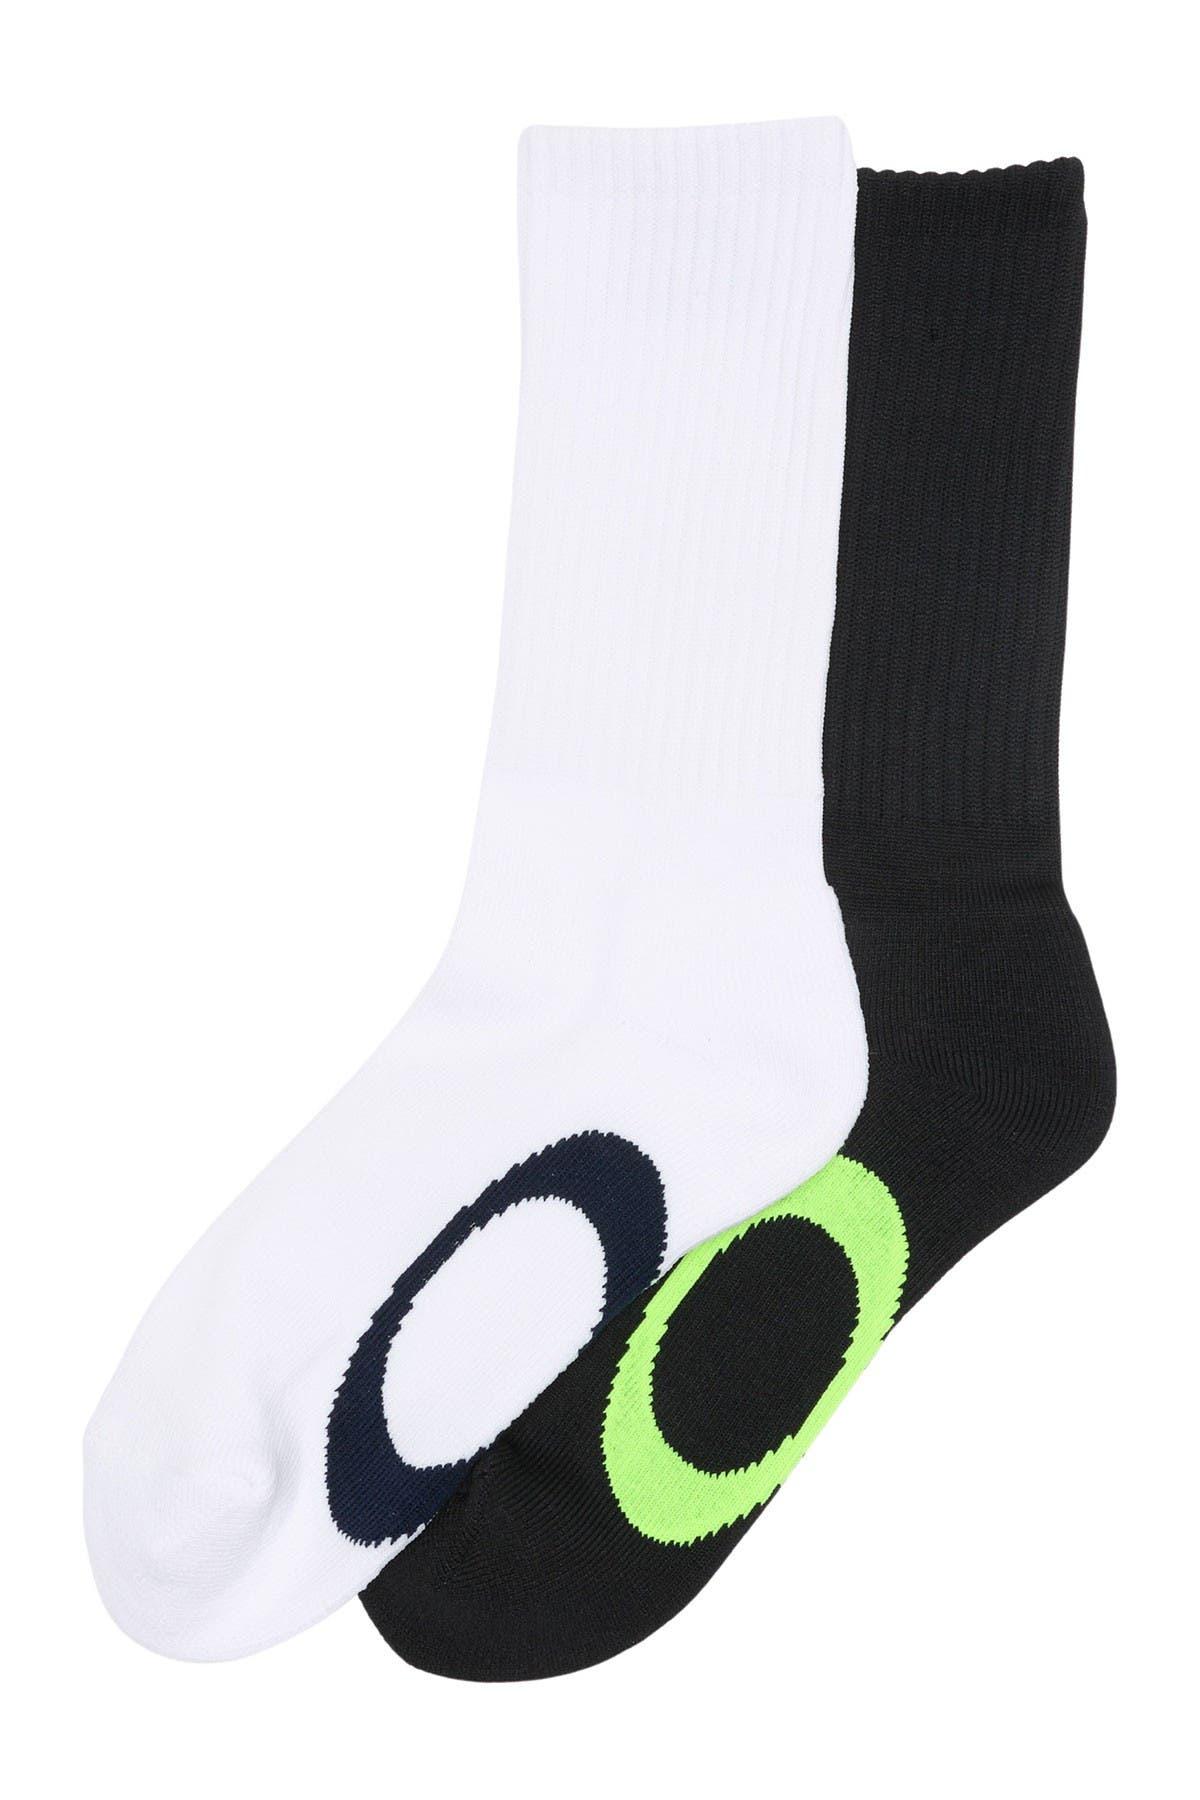 Image of Oakley Ellipse Logo Macro Crew Socks - Pack of 2